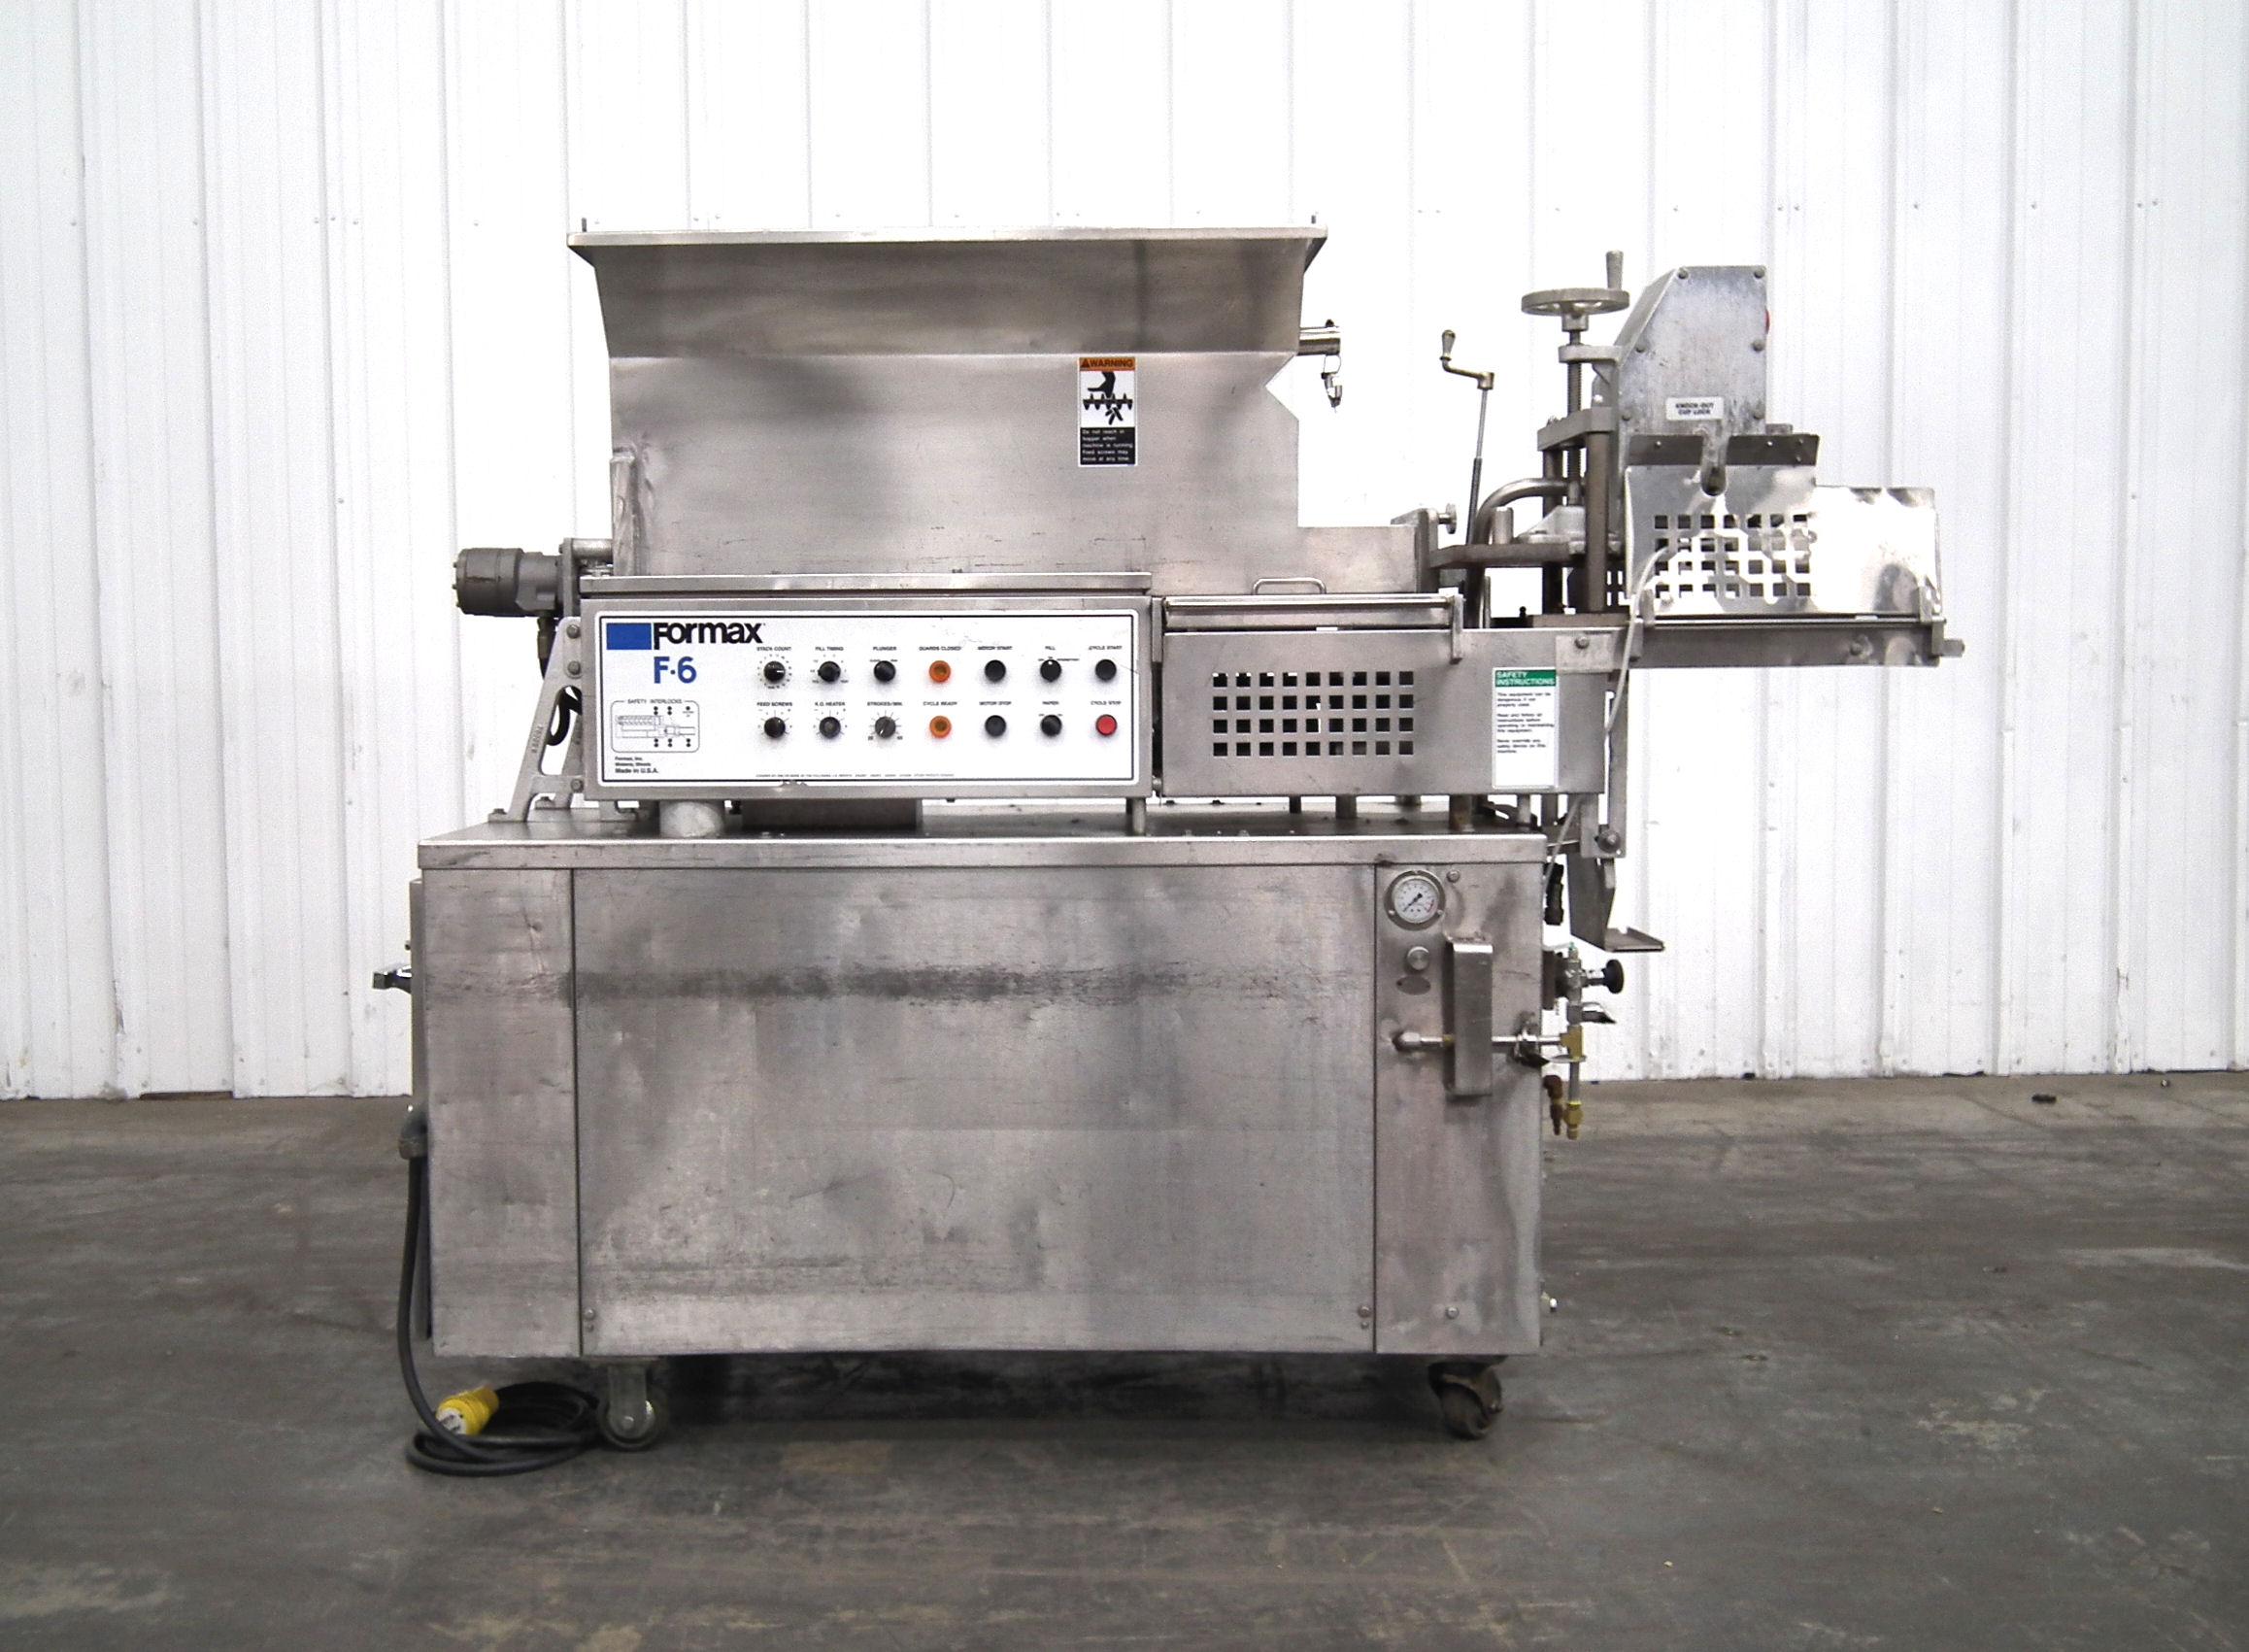 Formax PFM-6 Patty Former Vac-Tear Paper System A1952 - Image 2 of 15